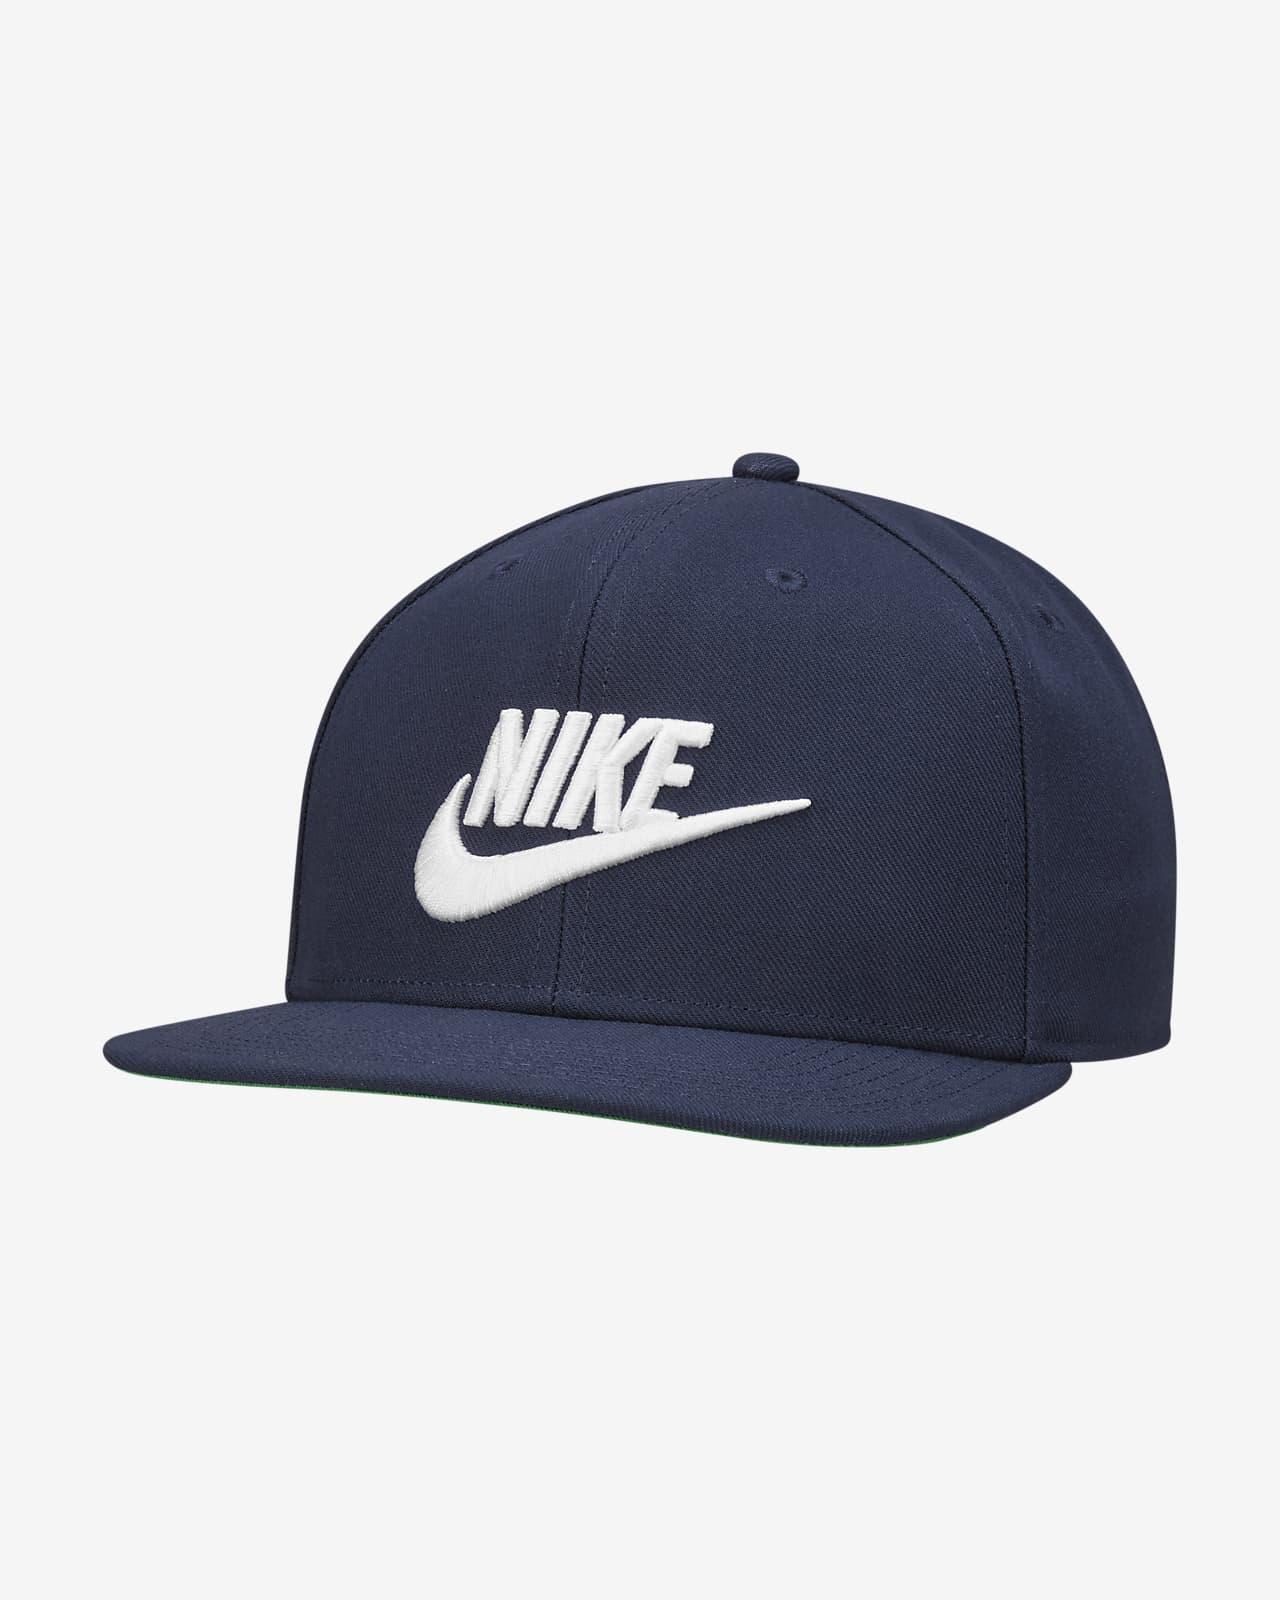 Nike Sportswear Dri-FIT Pro Futura állítható sapka